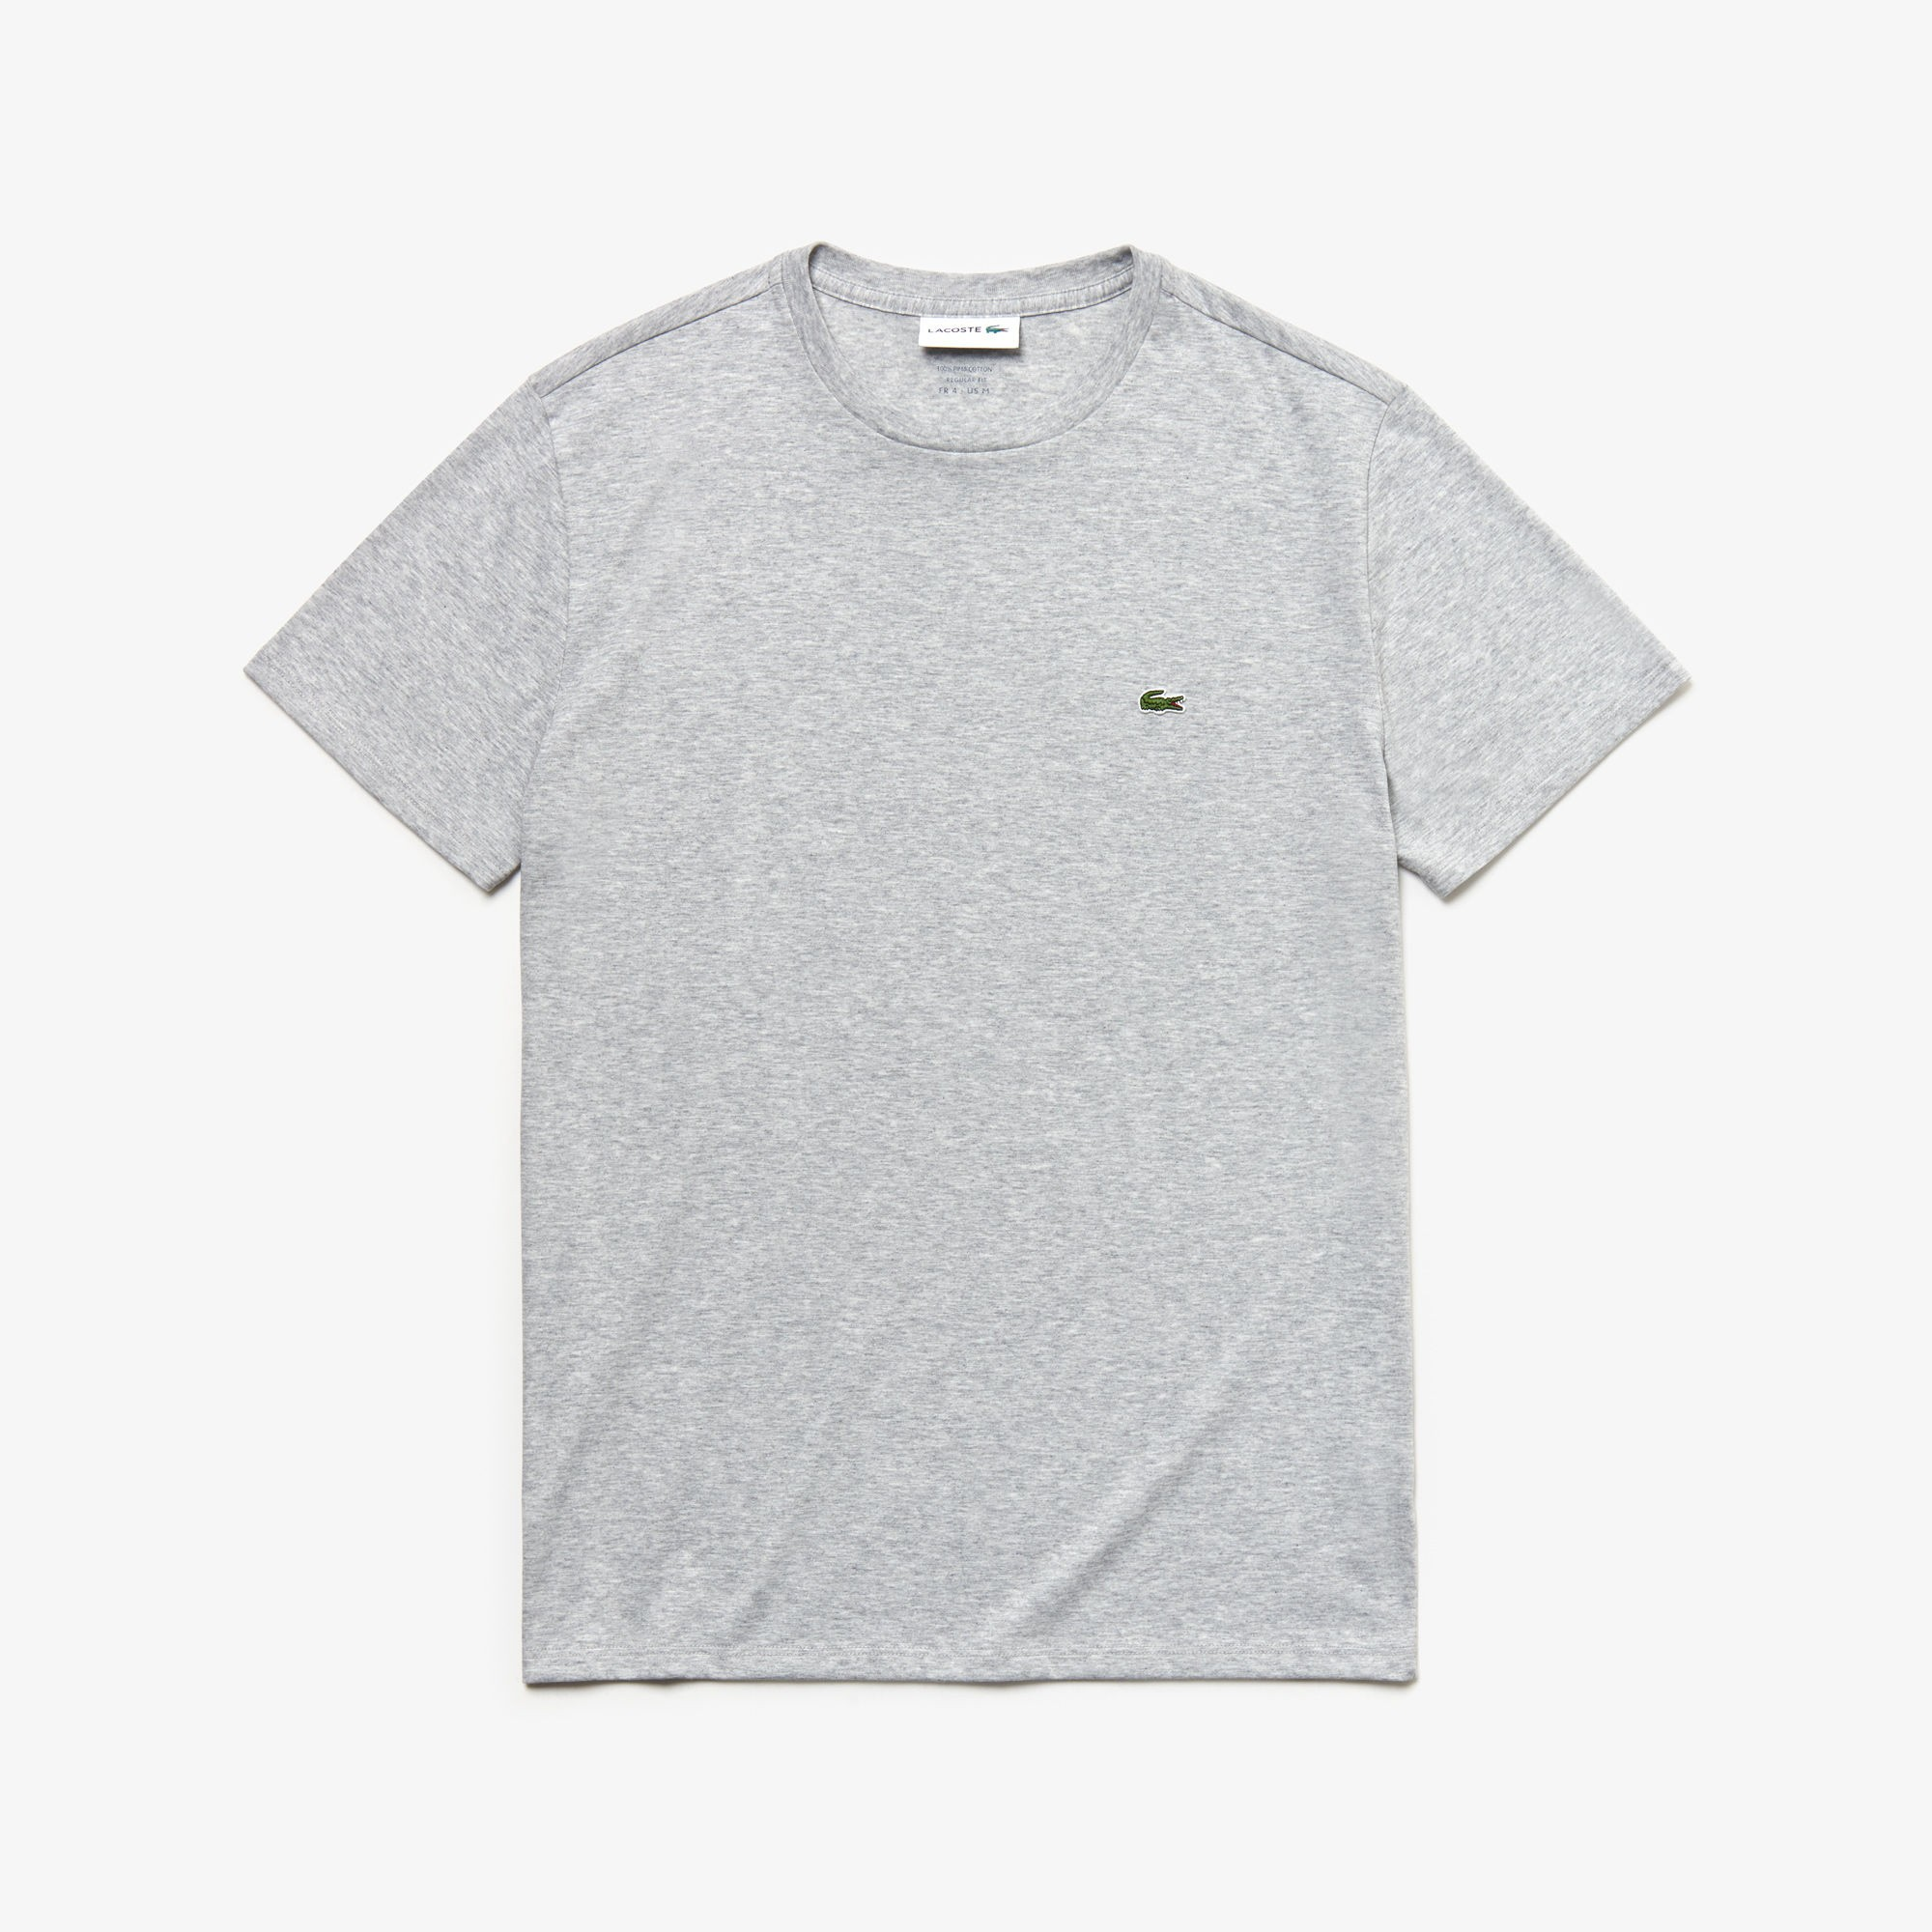 Shirt be T Sportschoenshop Grijs Lacoste qcBpwWZXYp